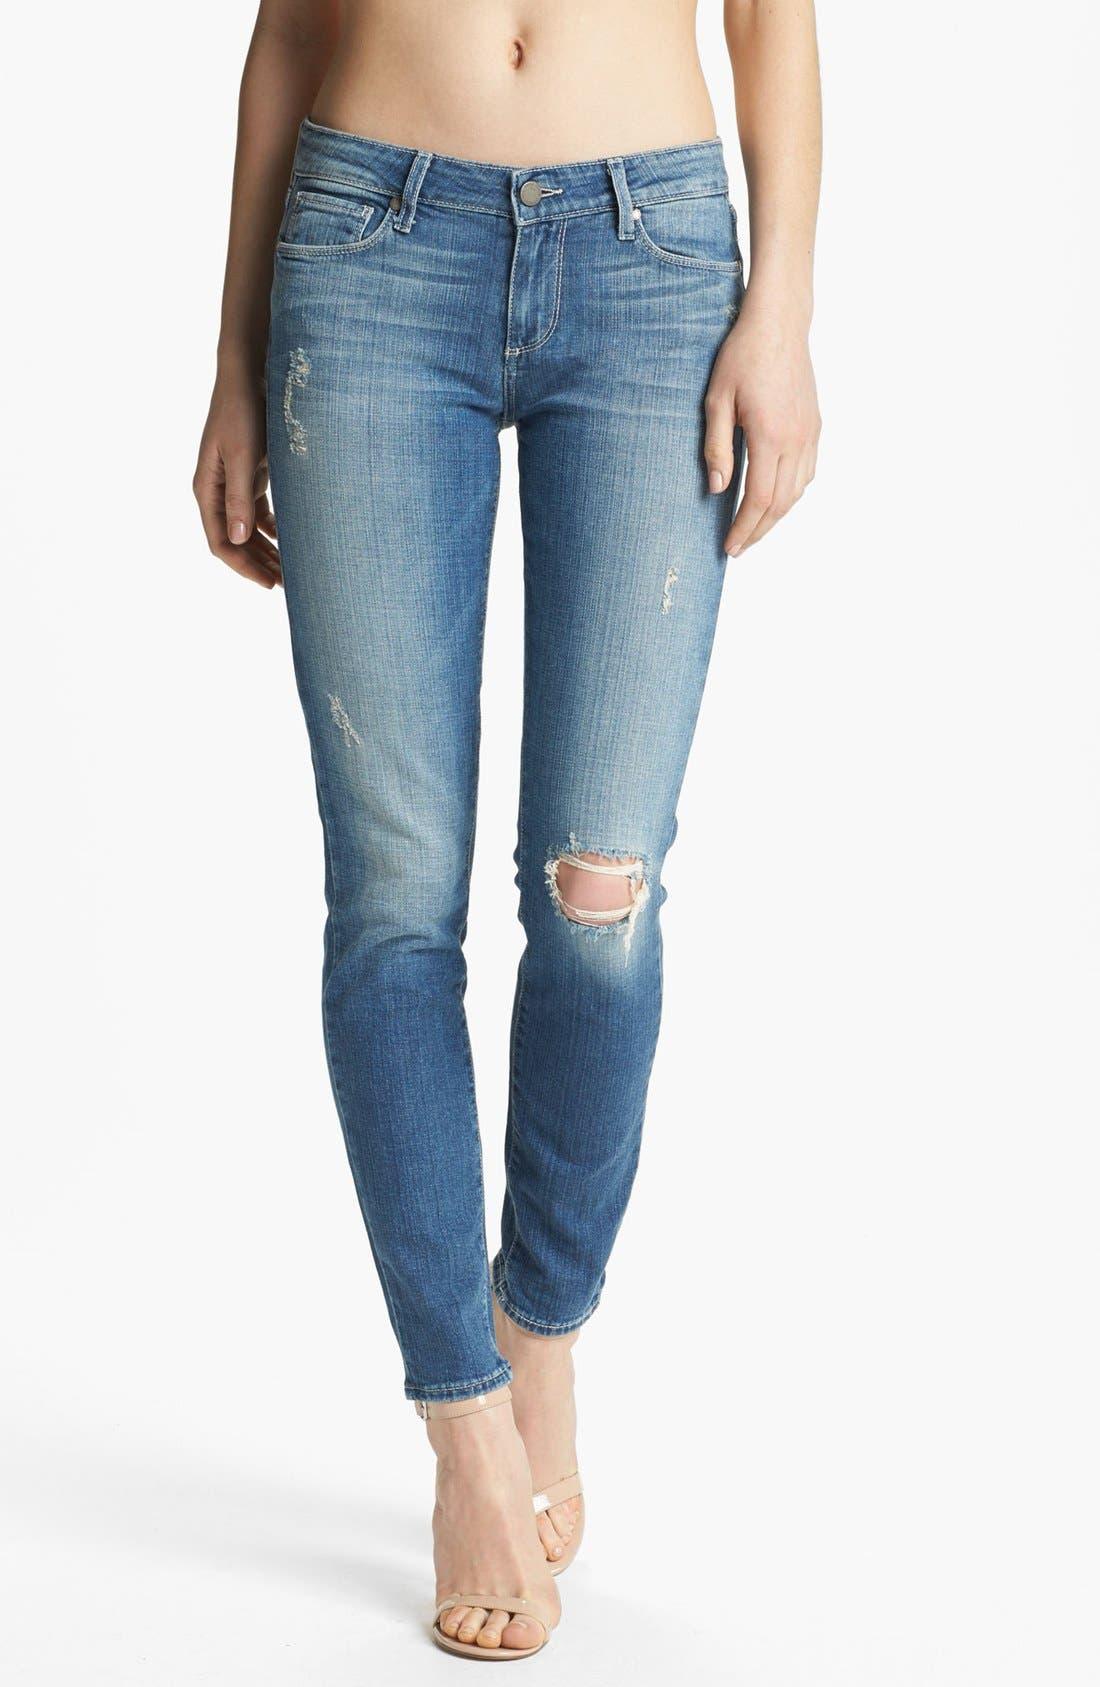 Alternate Image 1 Selected - Paige Denim 'Verdugo' Ultra Skinny Jeans (Lynn Destructed)